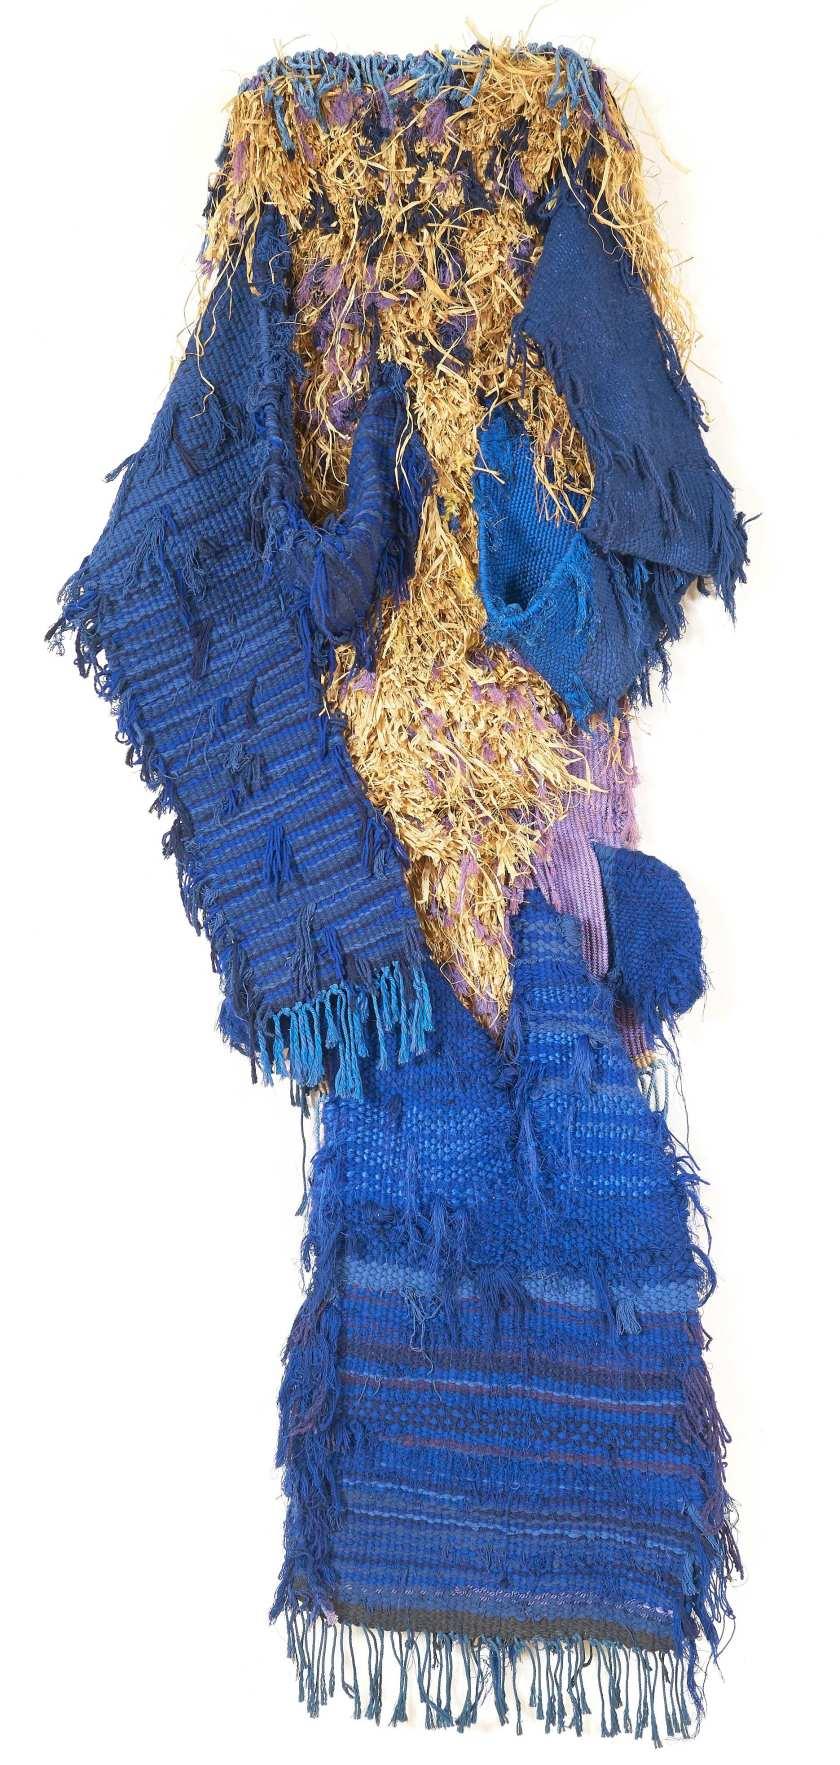 J. Grau Garrriga Blue Personnage, Cotton, wool and raffia  200x80 cm 1992.JPG